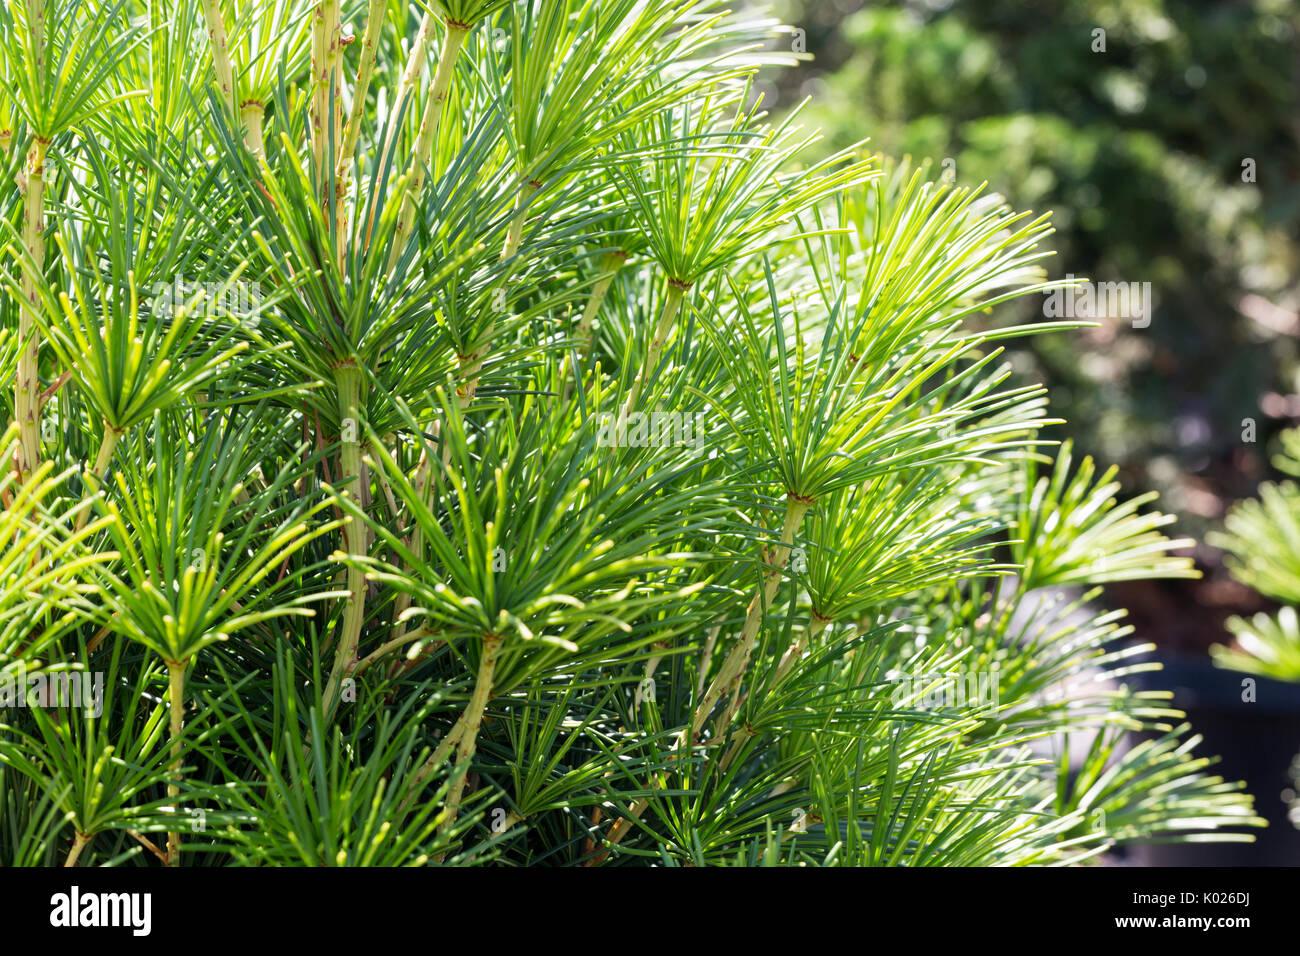 Close up view of a Japanese Umbrella Tree Stock Photo